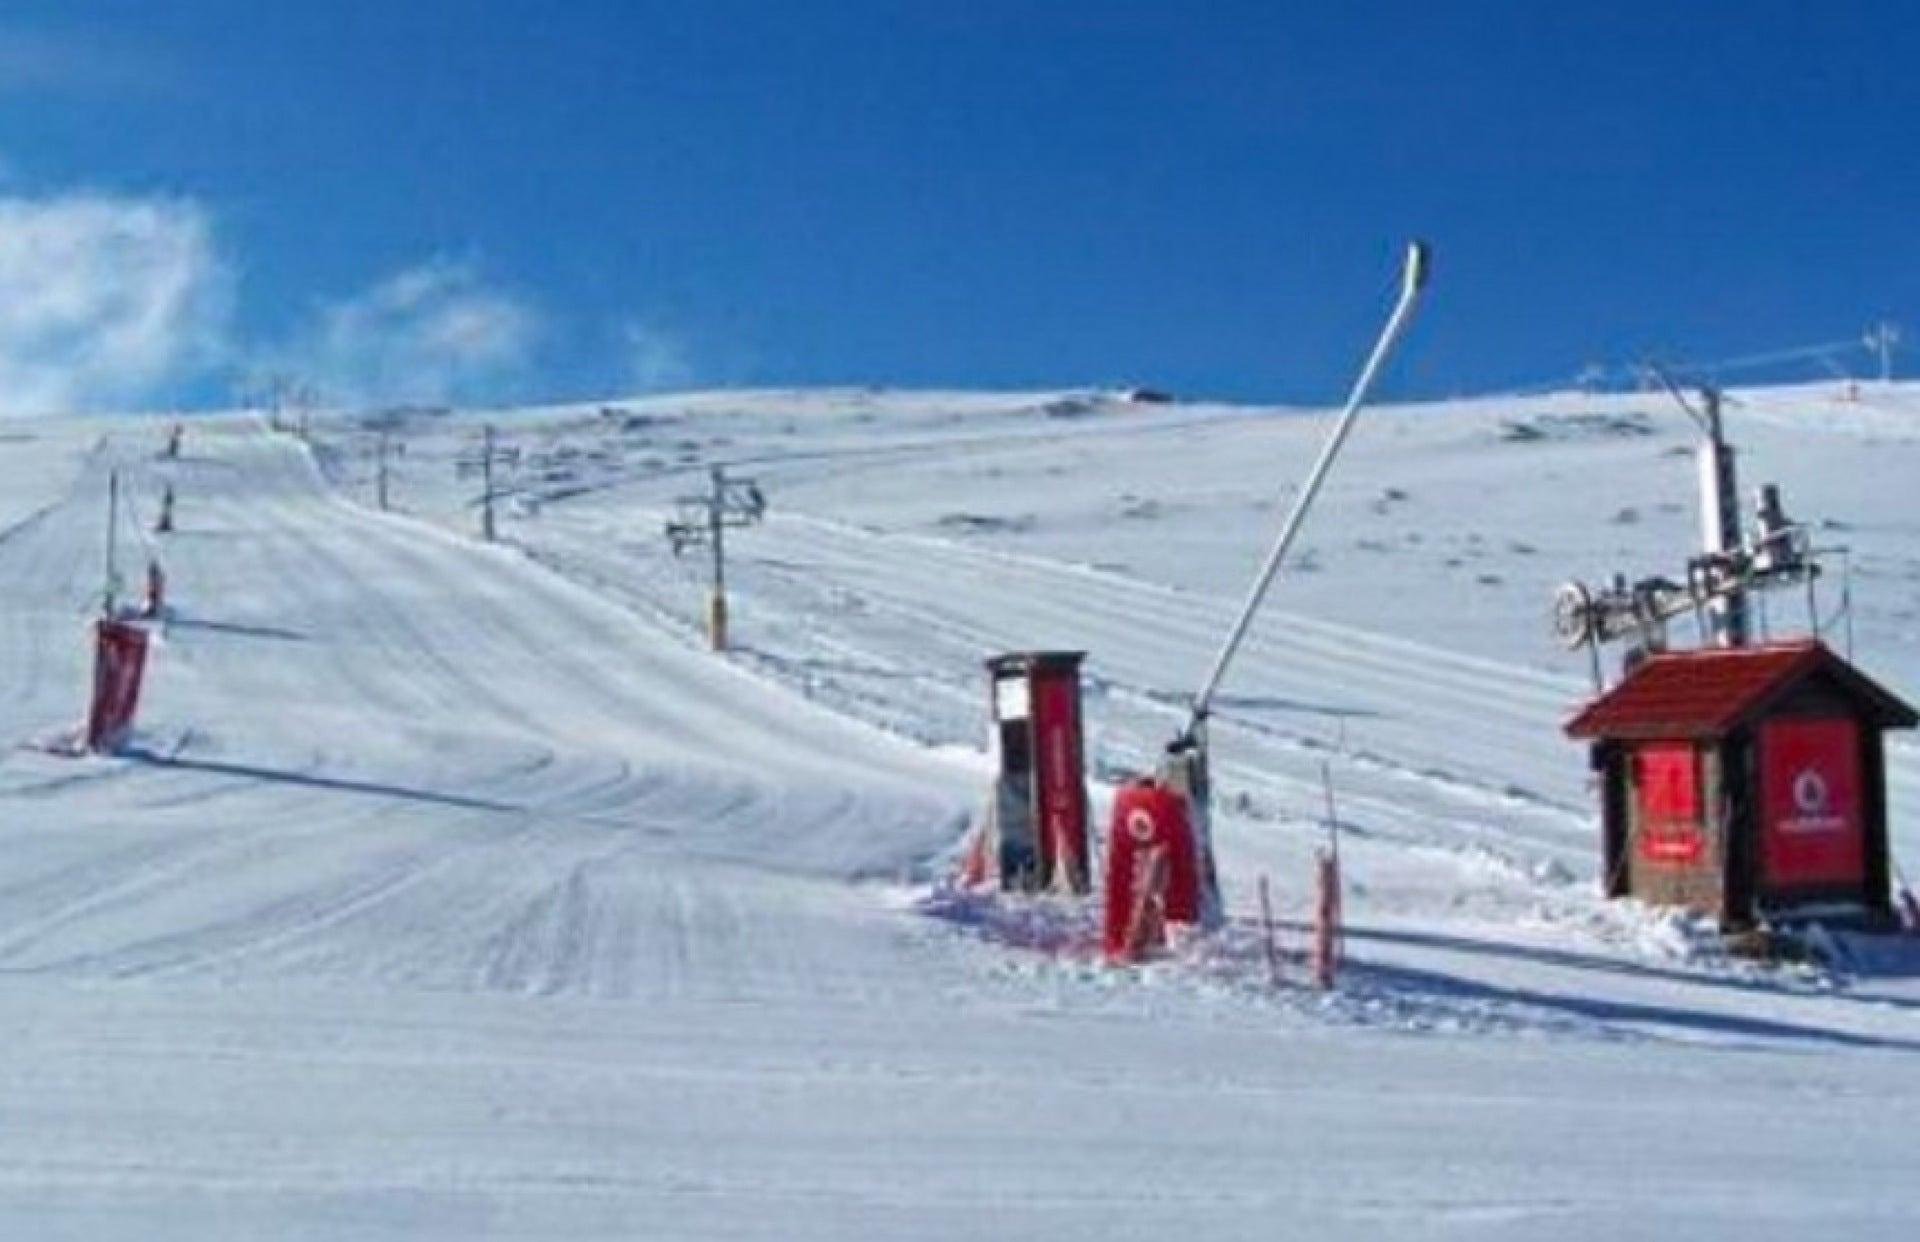 estância de ski vodafone